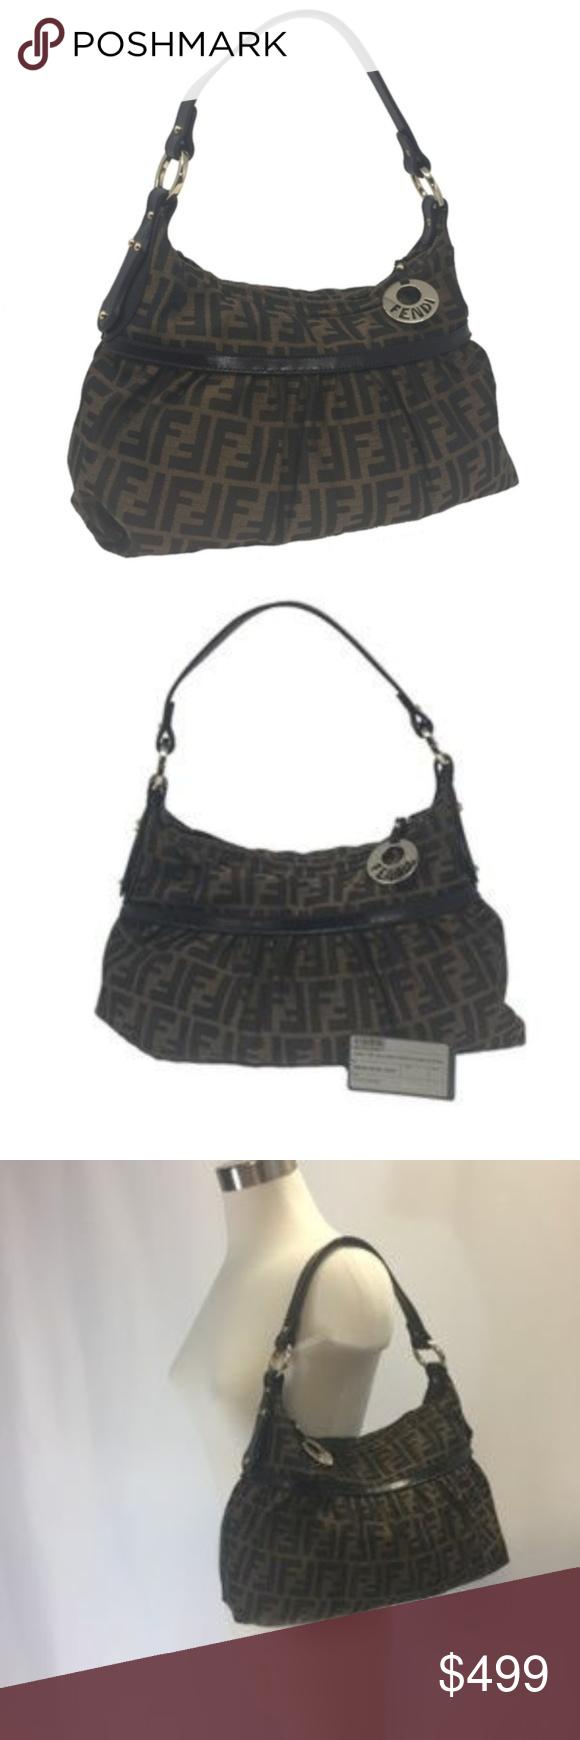 78b9f5d8b2 NWT Fendi Zucca   Leather with Fendi Zipper Pull WONDERFUL HANDBAG THAT IS  VERY EASY TO